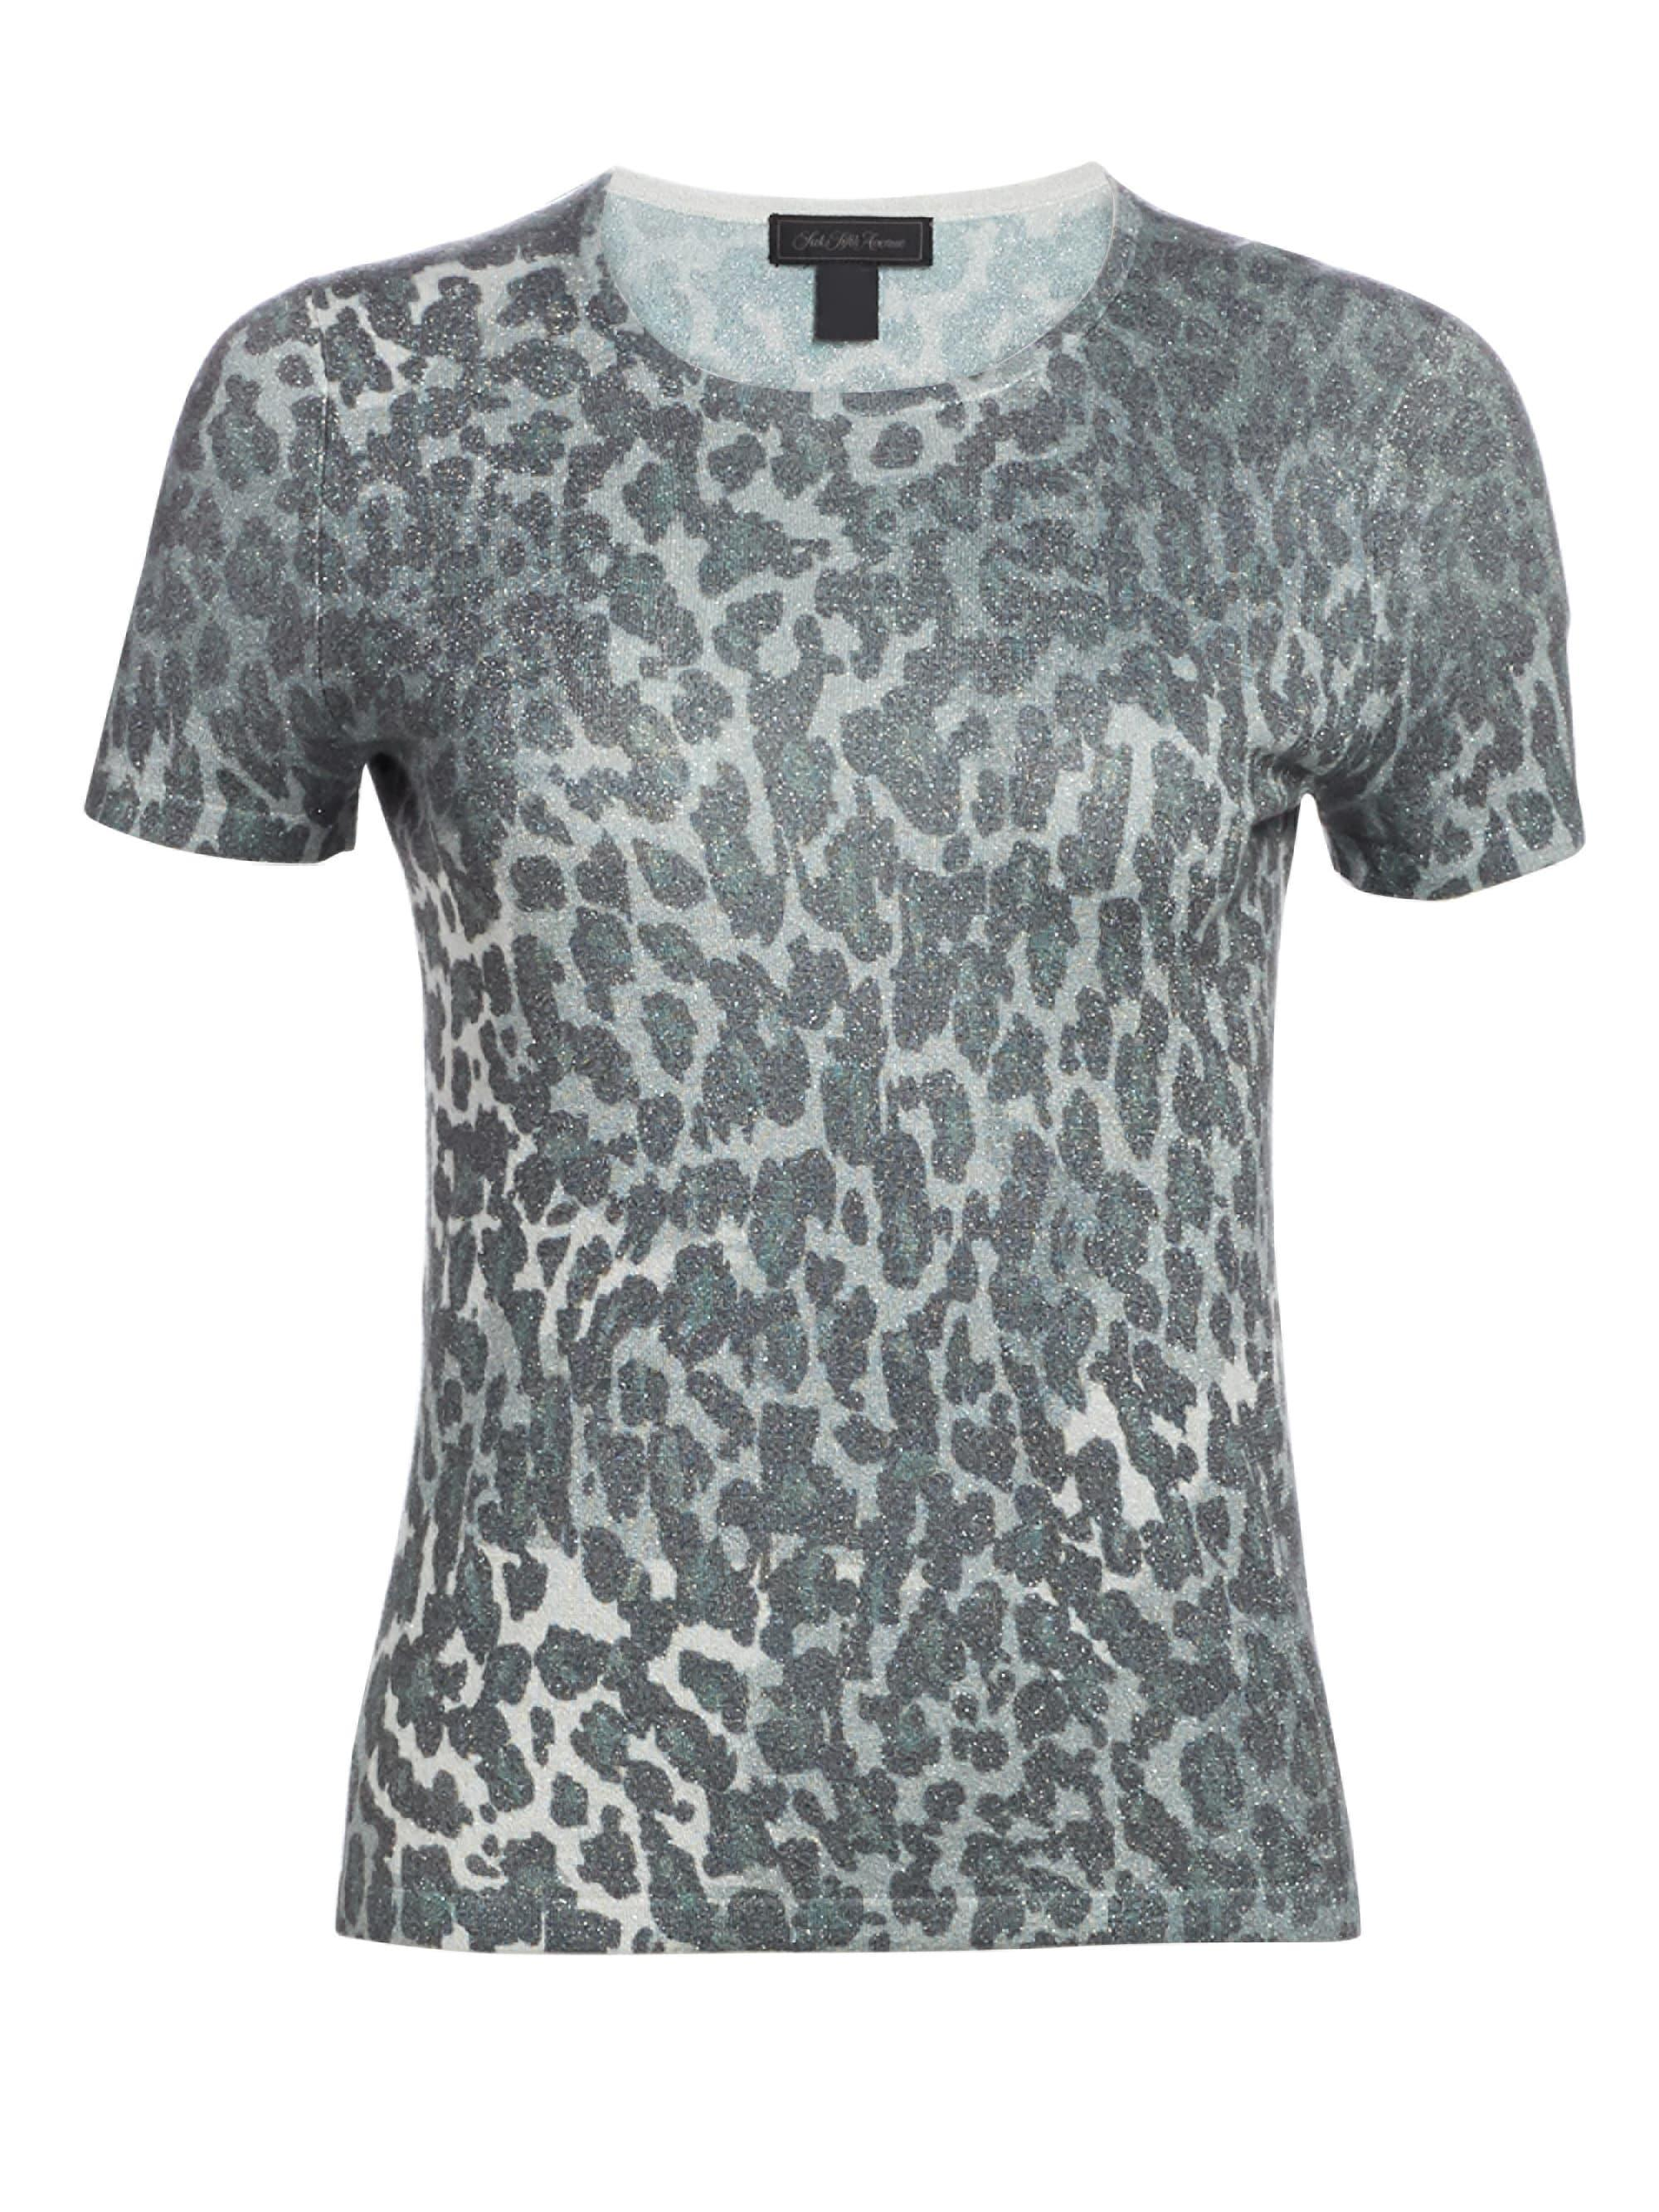 efe018c02238 Saks Fifth Avenue. Gray Women's Lurex Animal Print Tee - Fog Green Combo - Size  Xs